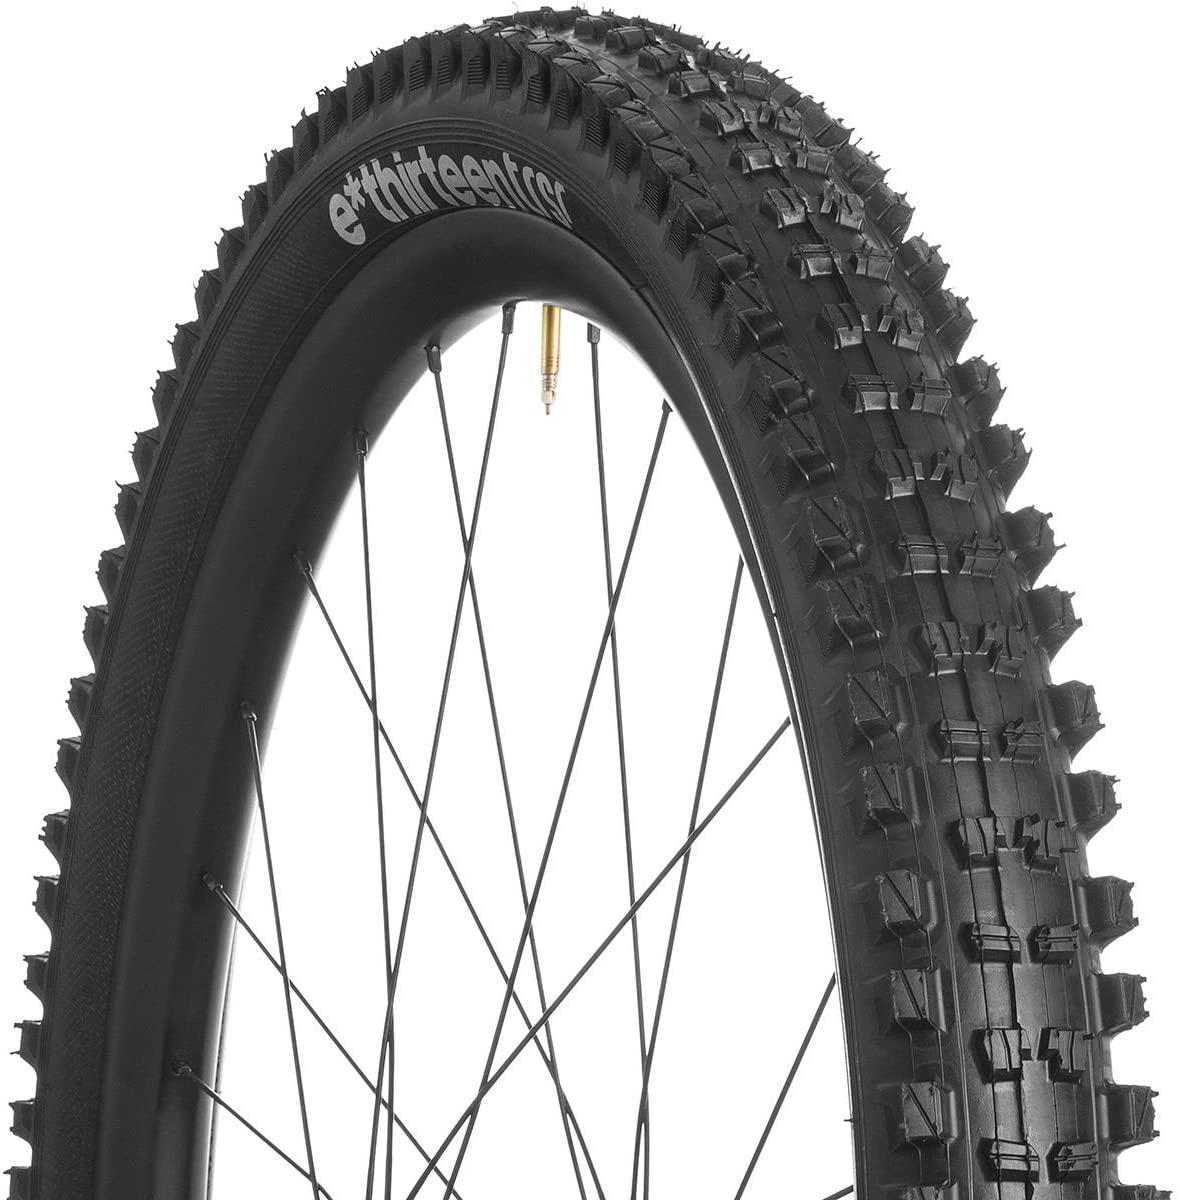 ethirteen Components TRS Race 27.5in Tire - 2018 Black, 27.5x2.35